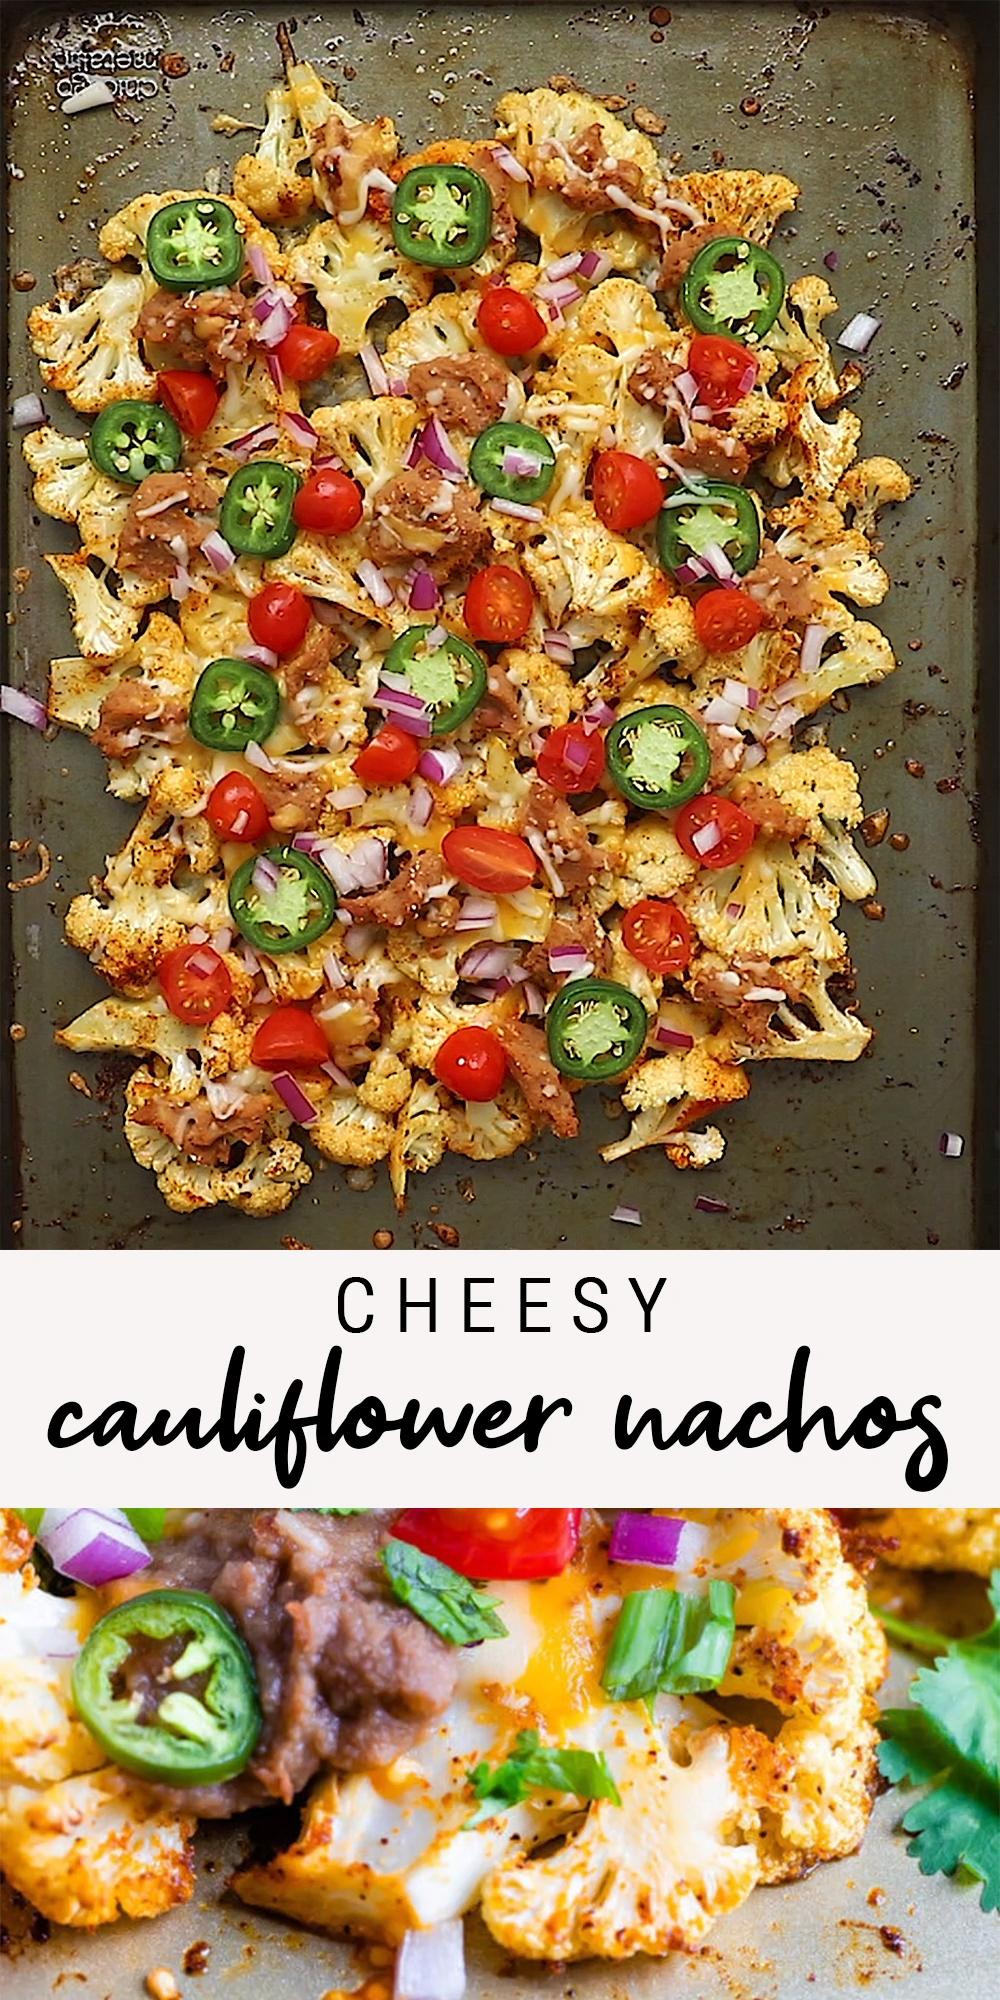 Cheesy Baked Cauliflower Nachos | Healthy Low Carb Recipe